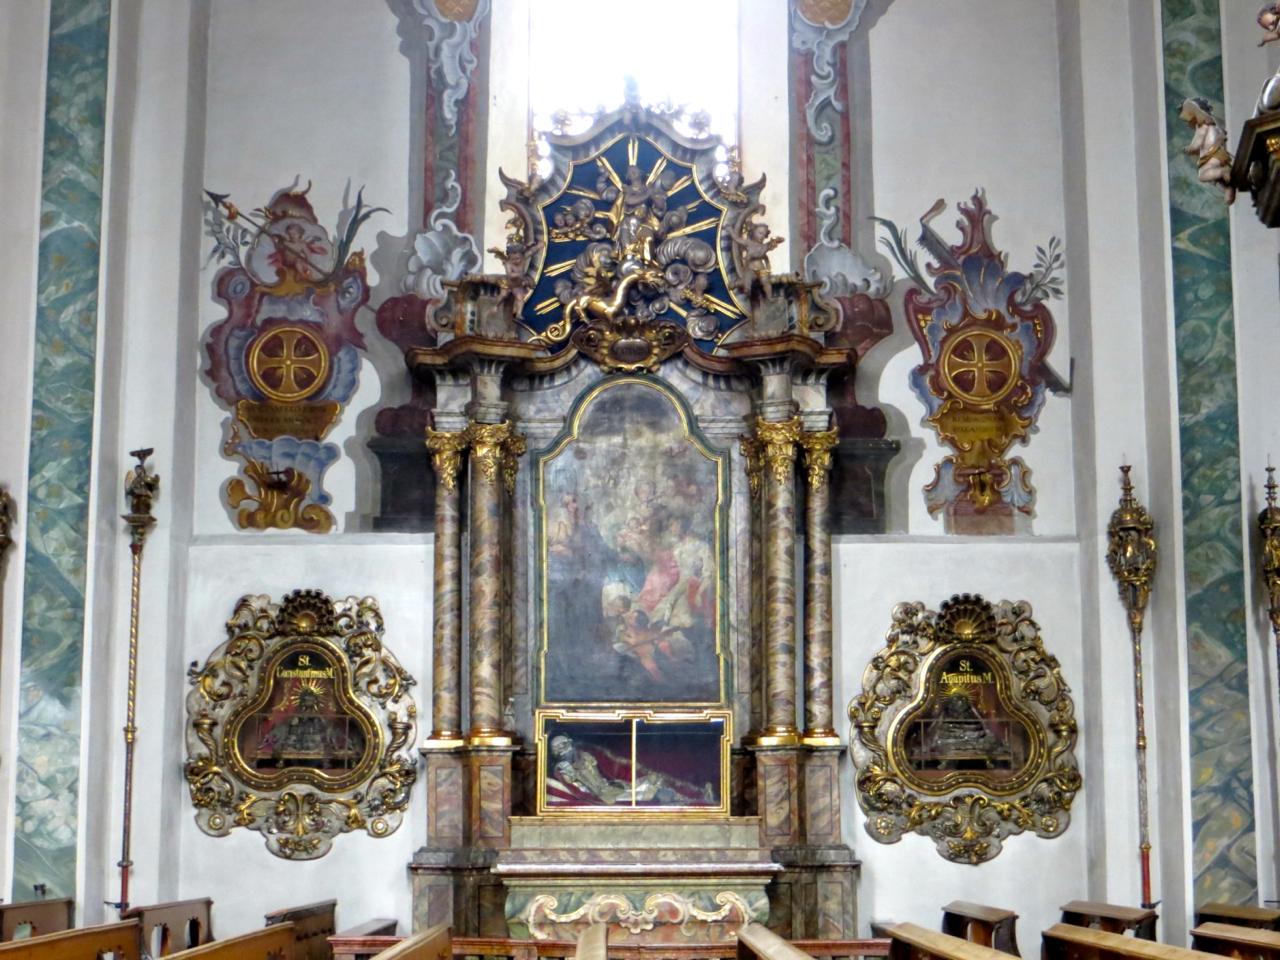 Relics of Catacomb Saints, Church of Saint Nikolaus, Hall in Tirol, Austria.